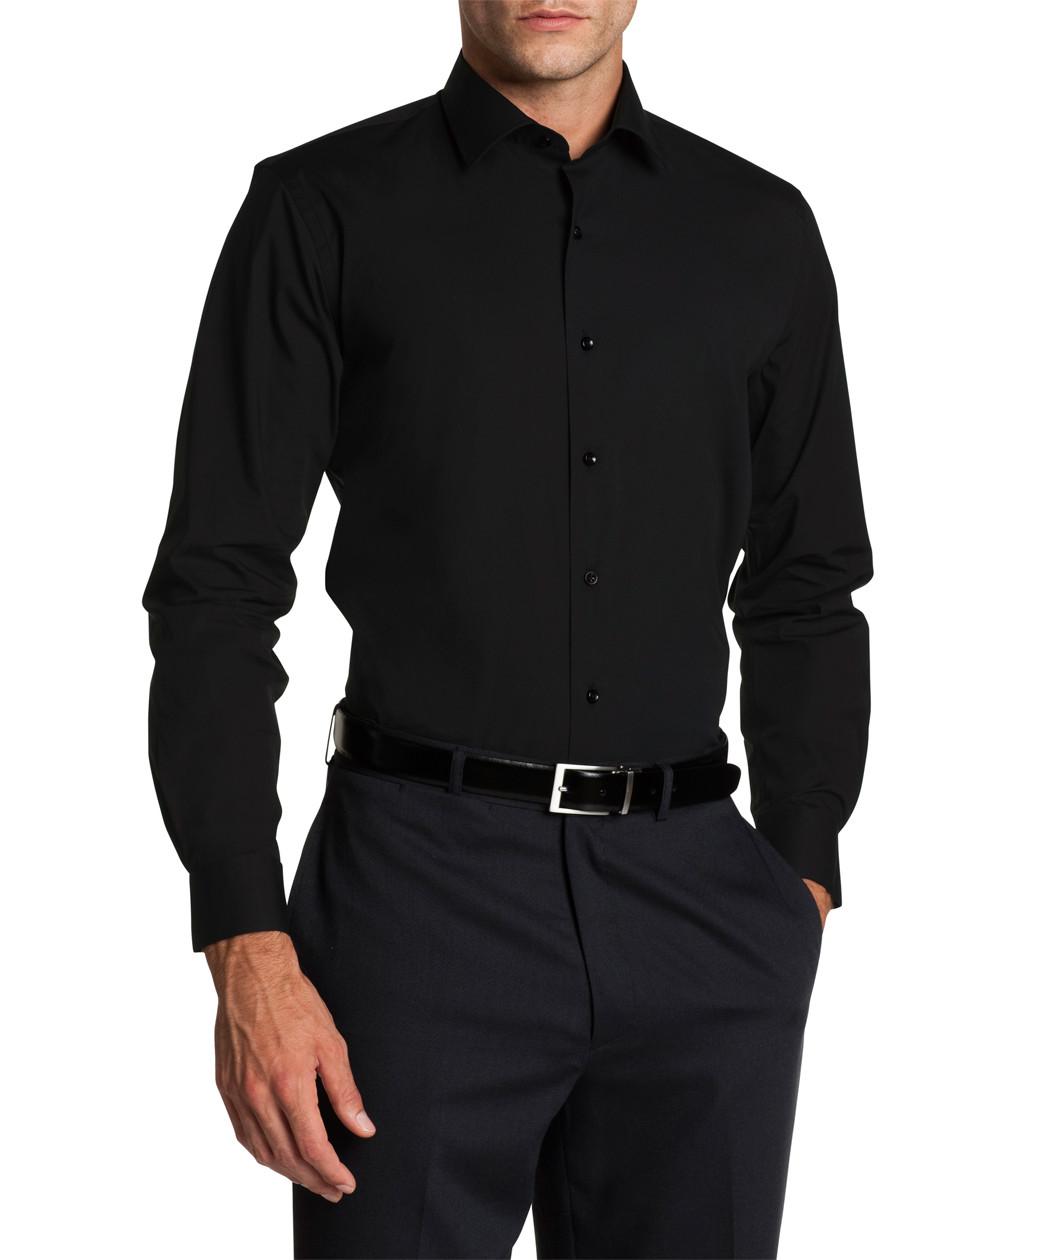 Van heusen black dress shirt dress online uk for Van heusen dress shirts